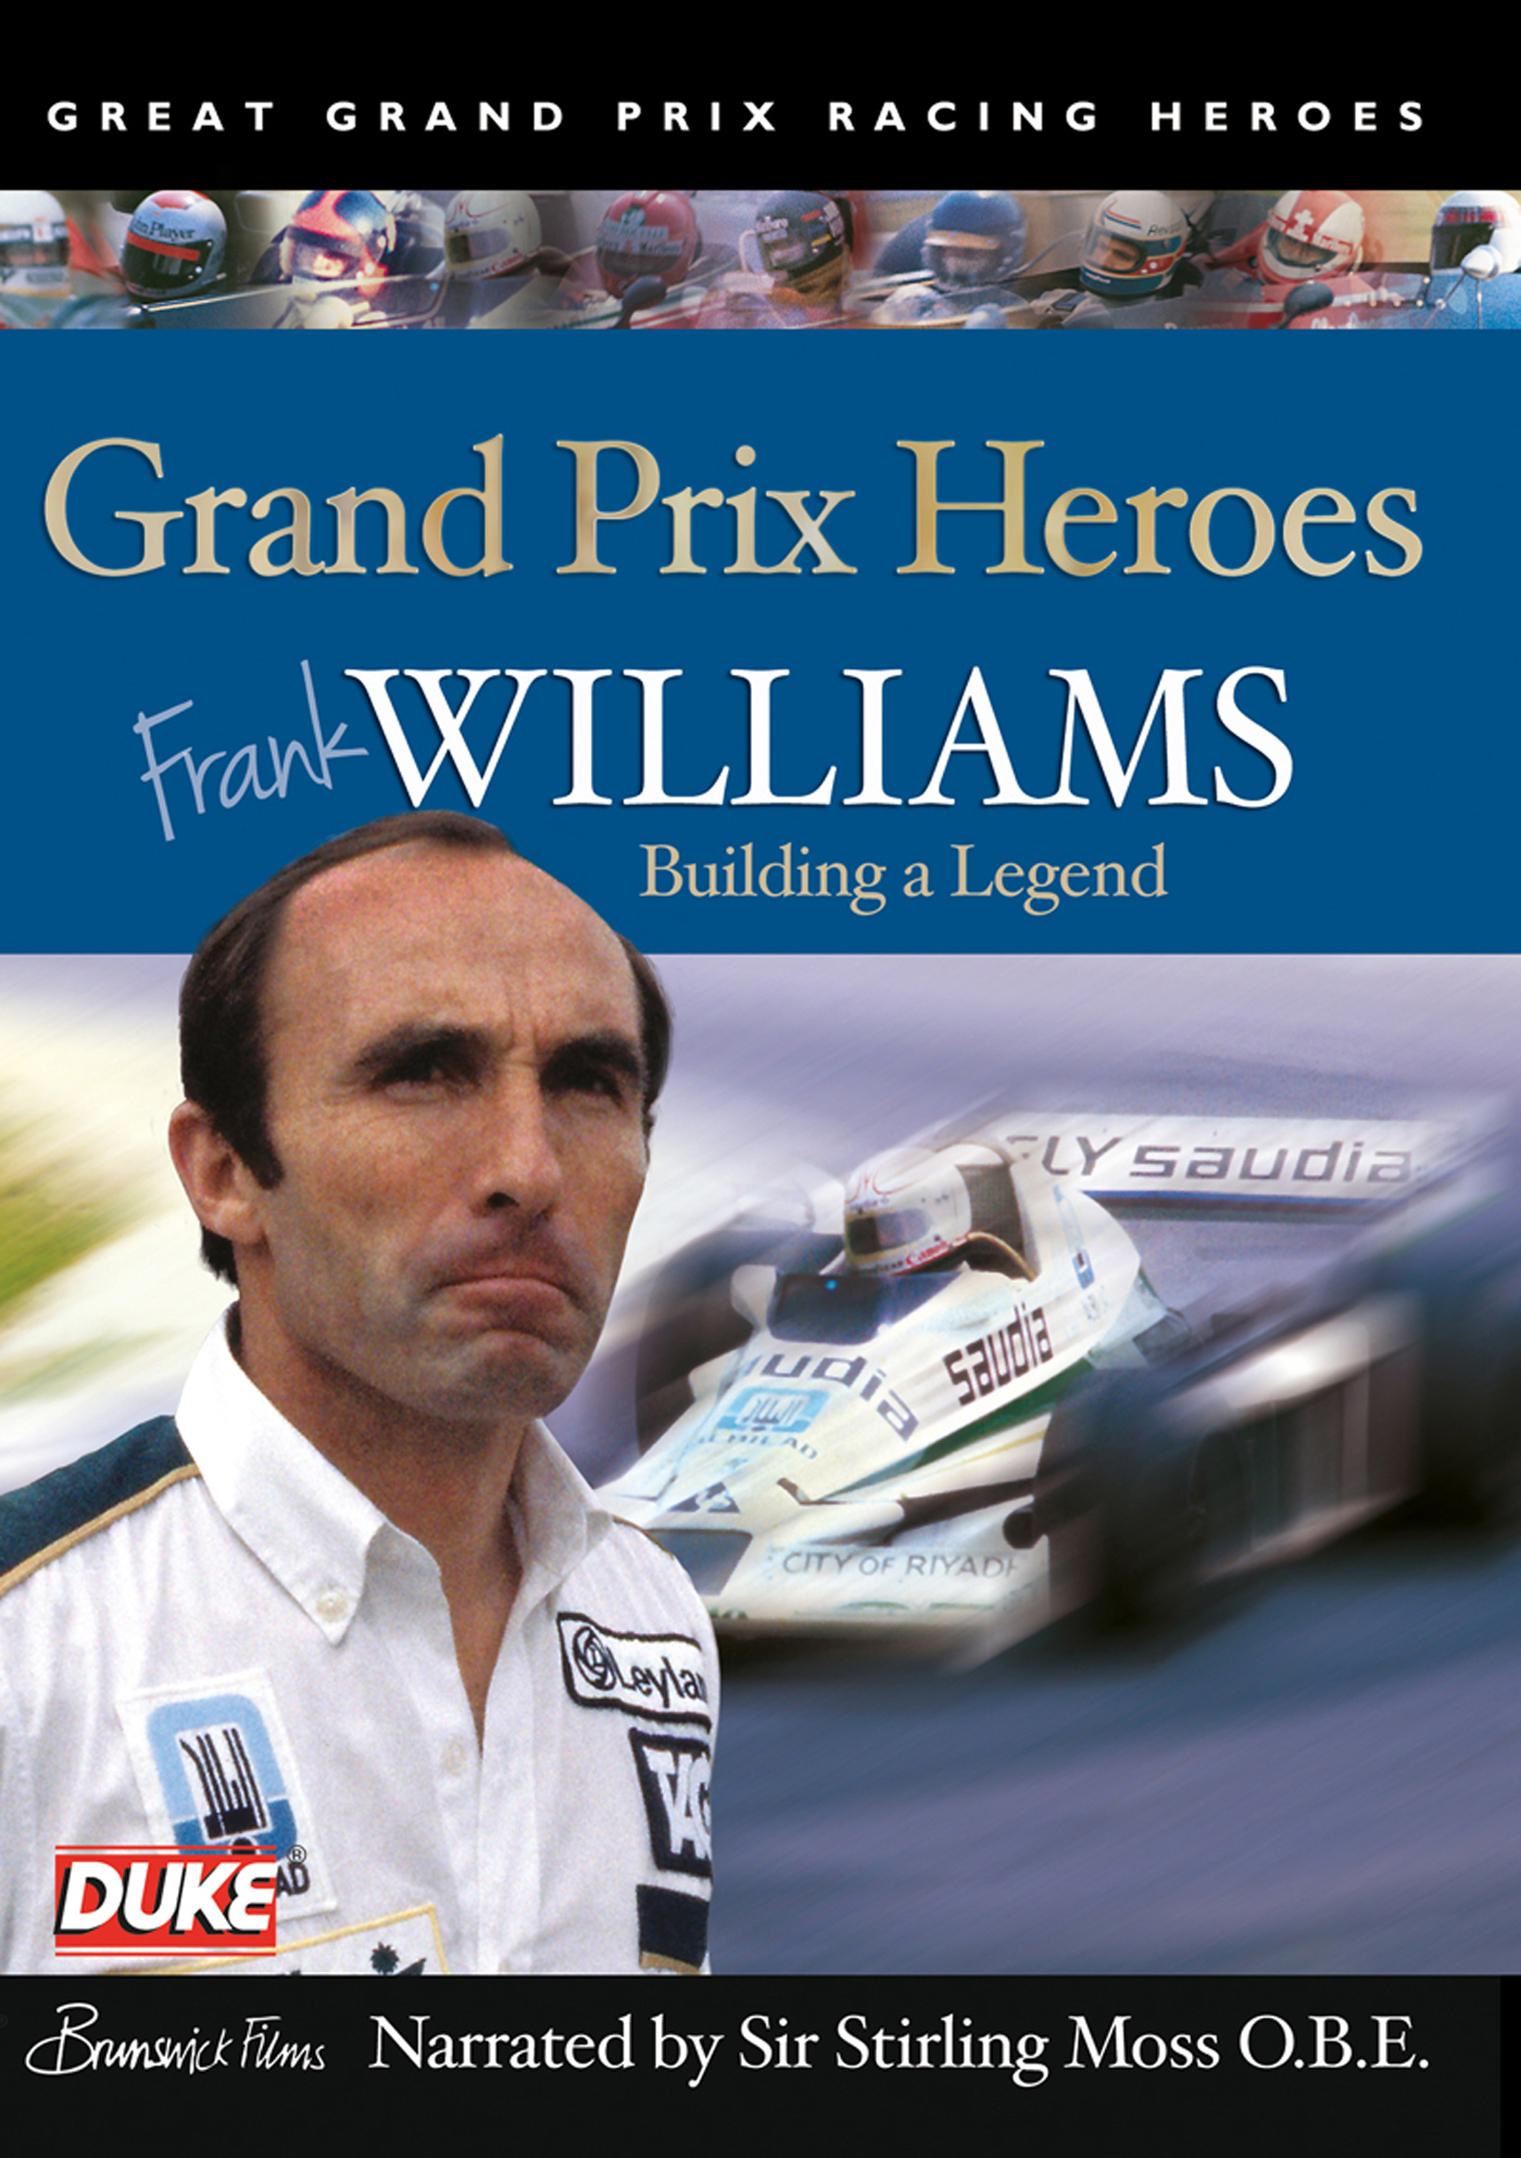 Grand Prix Heroes: Frank Williams - Building a Legend